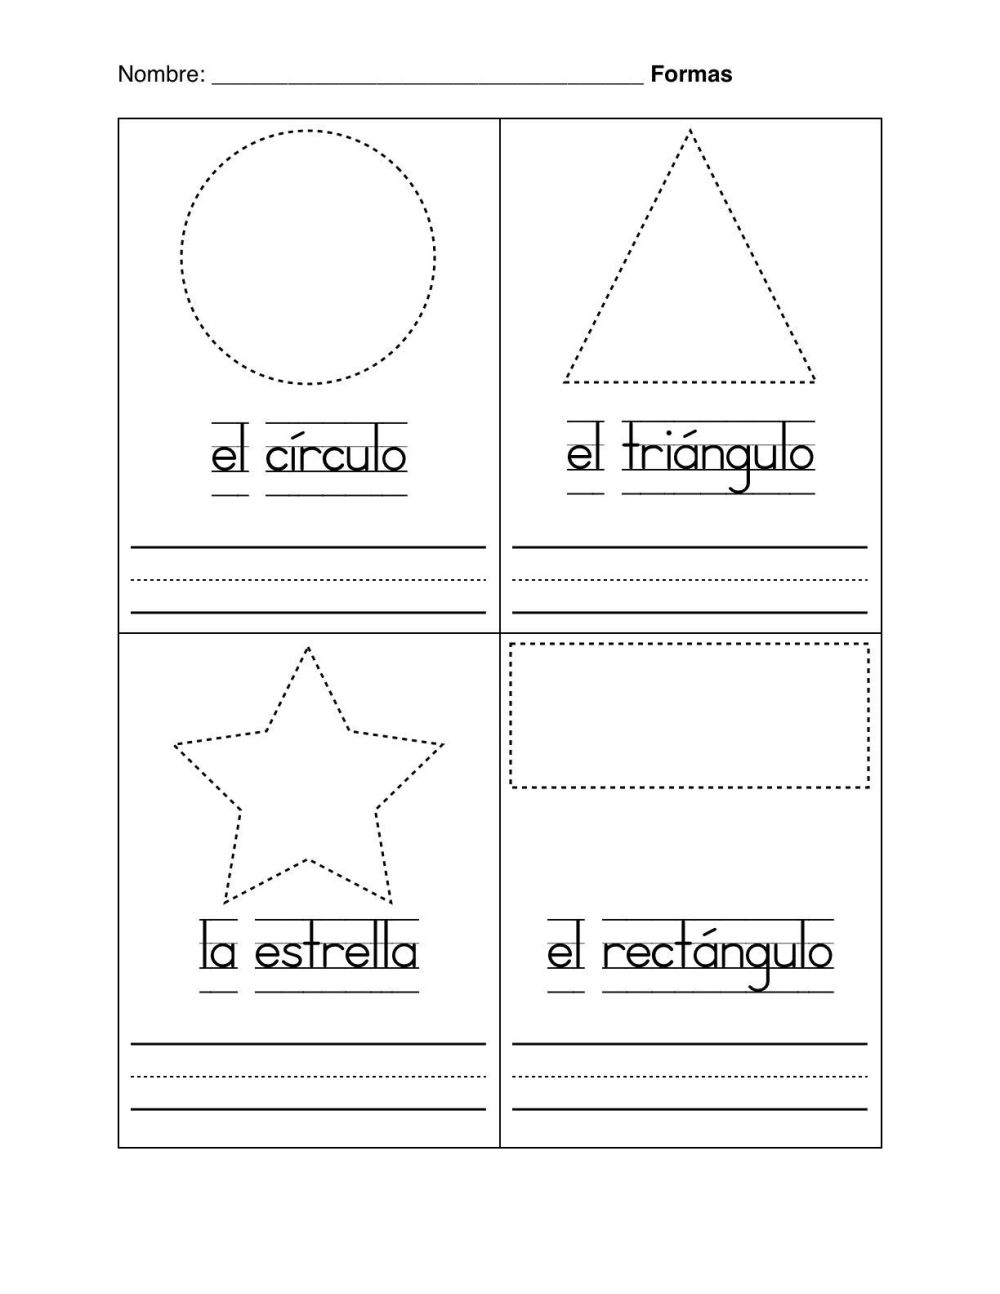 medium resolution of Spanish Worksheets For Kindergarten   Basic Shapes In Spanish on Best  Worksheets Collection 4185